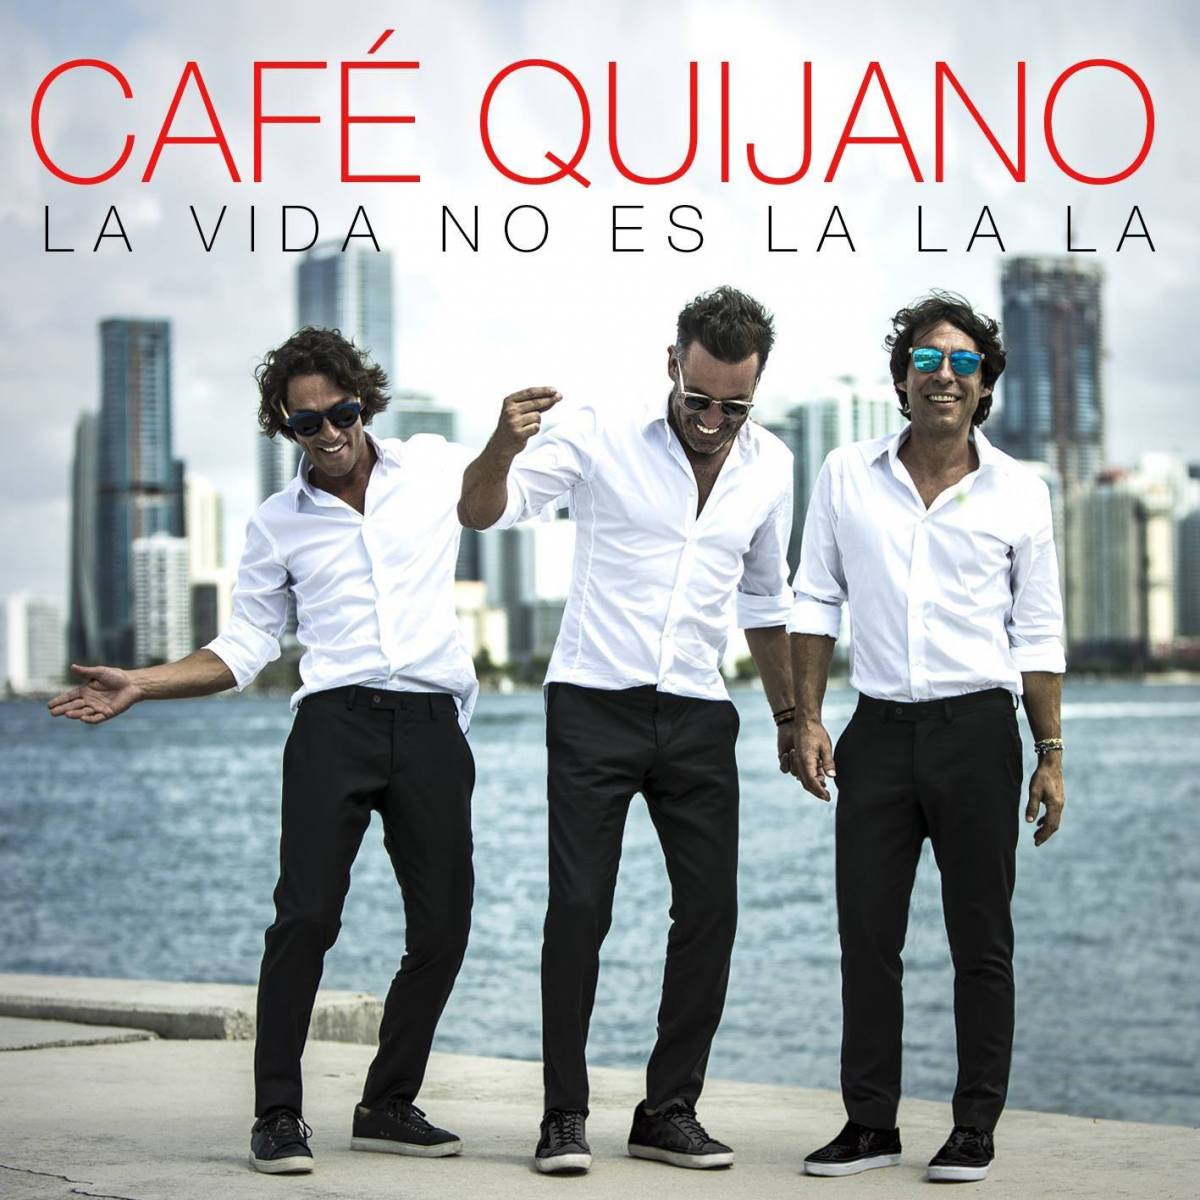 la-vida-no-es-la-la-la-Café-Quijano